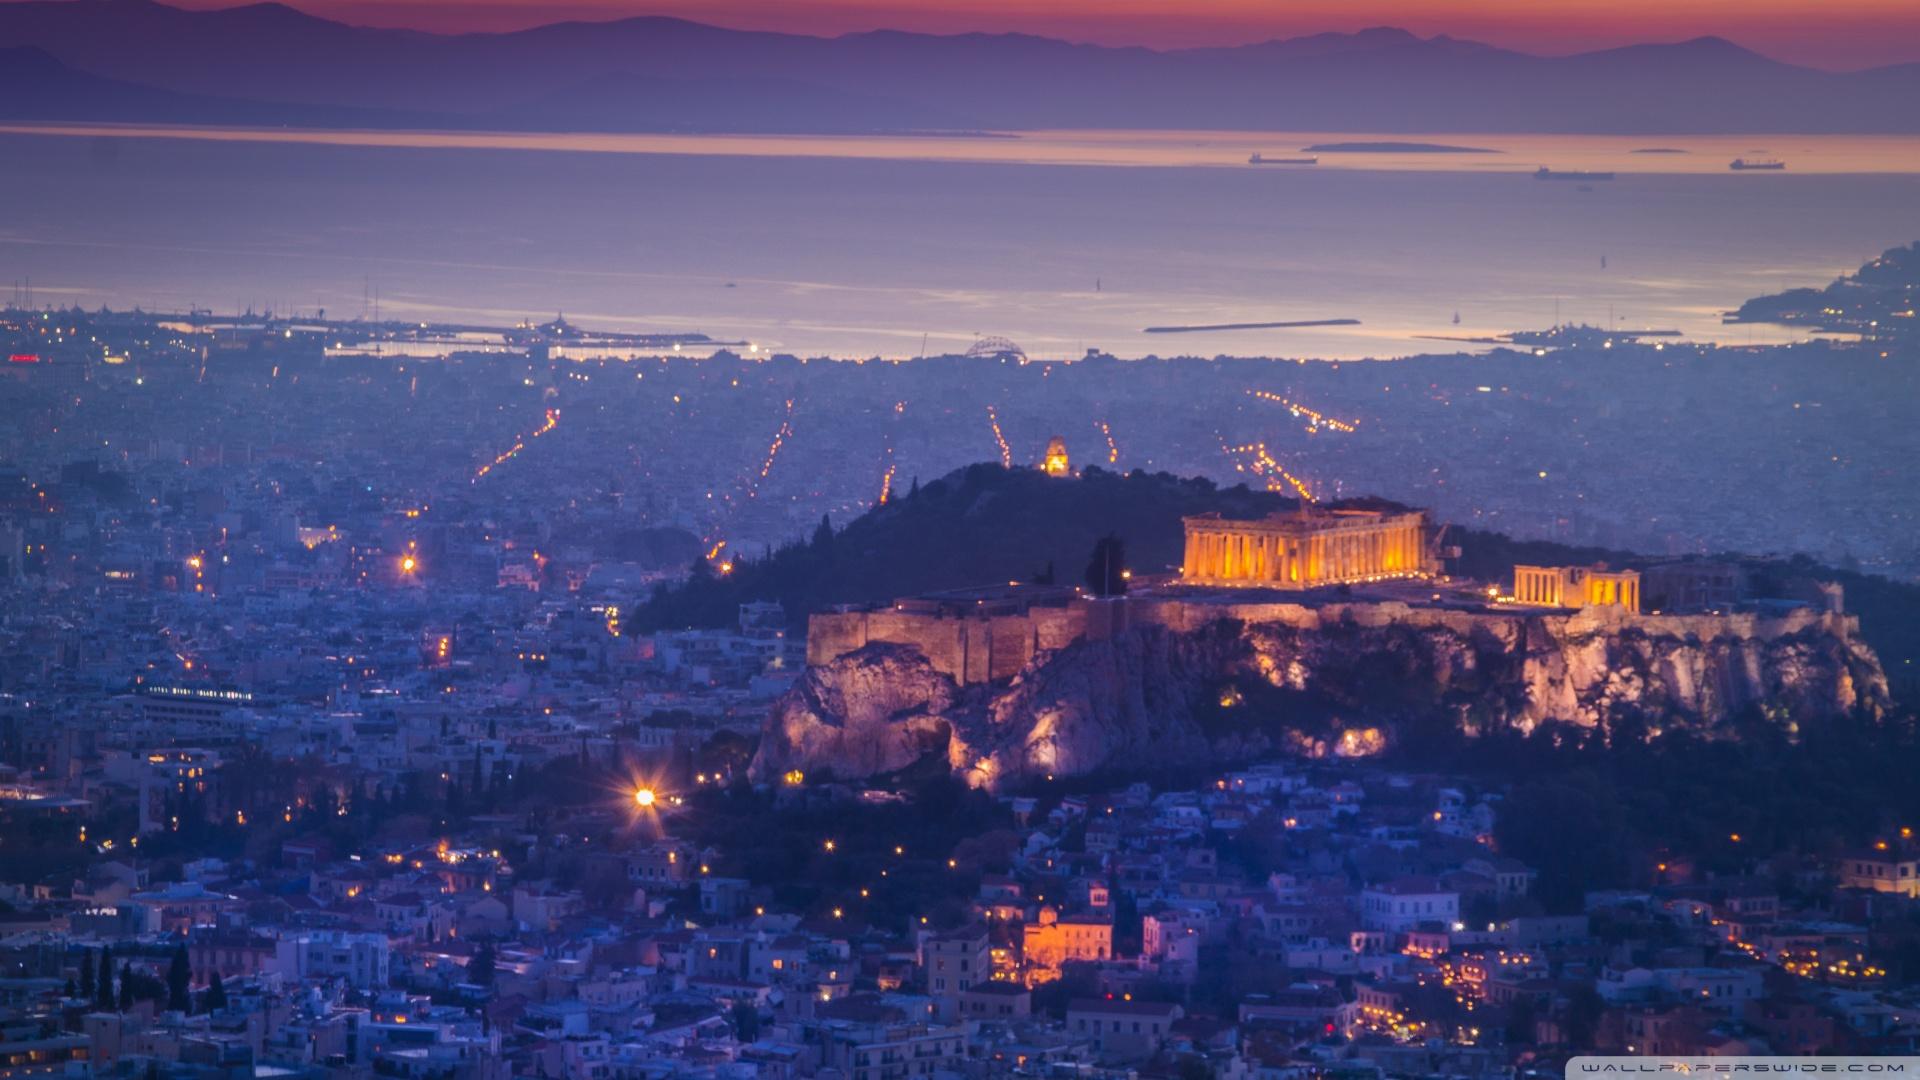 Athens by night 4K HD Desktop Wallpaper for 4K Ultra HD TV 1920x1080